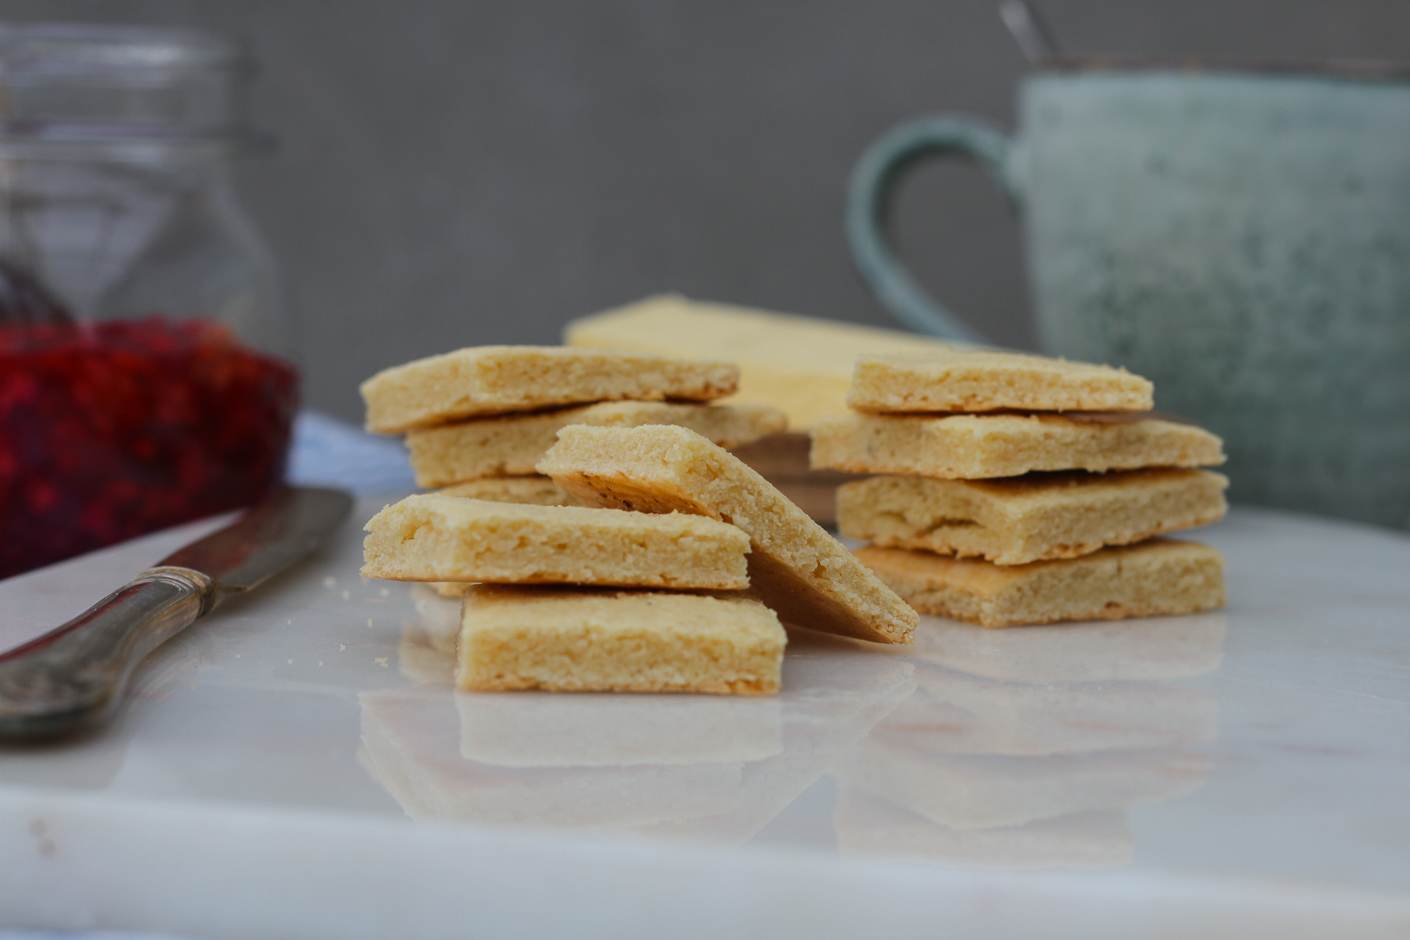 ljusa kex glutenfria mjölkfria paleo lchf